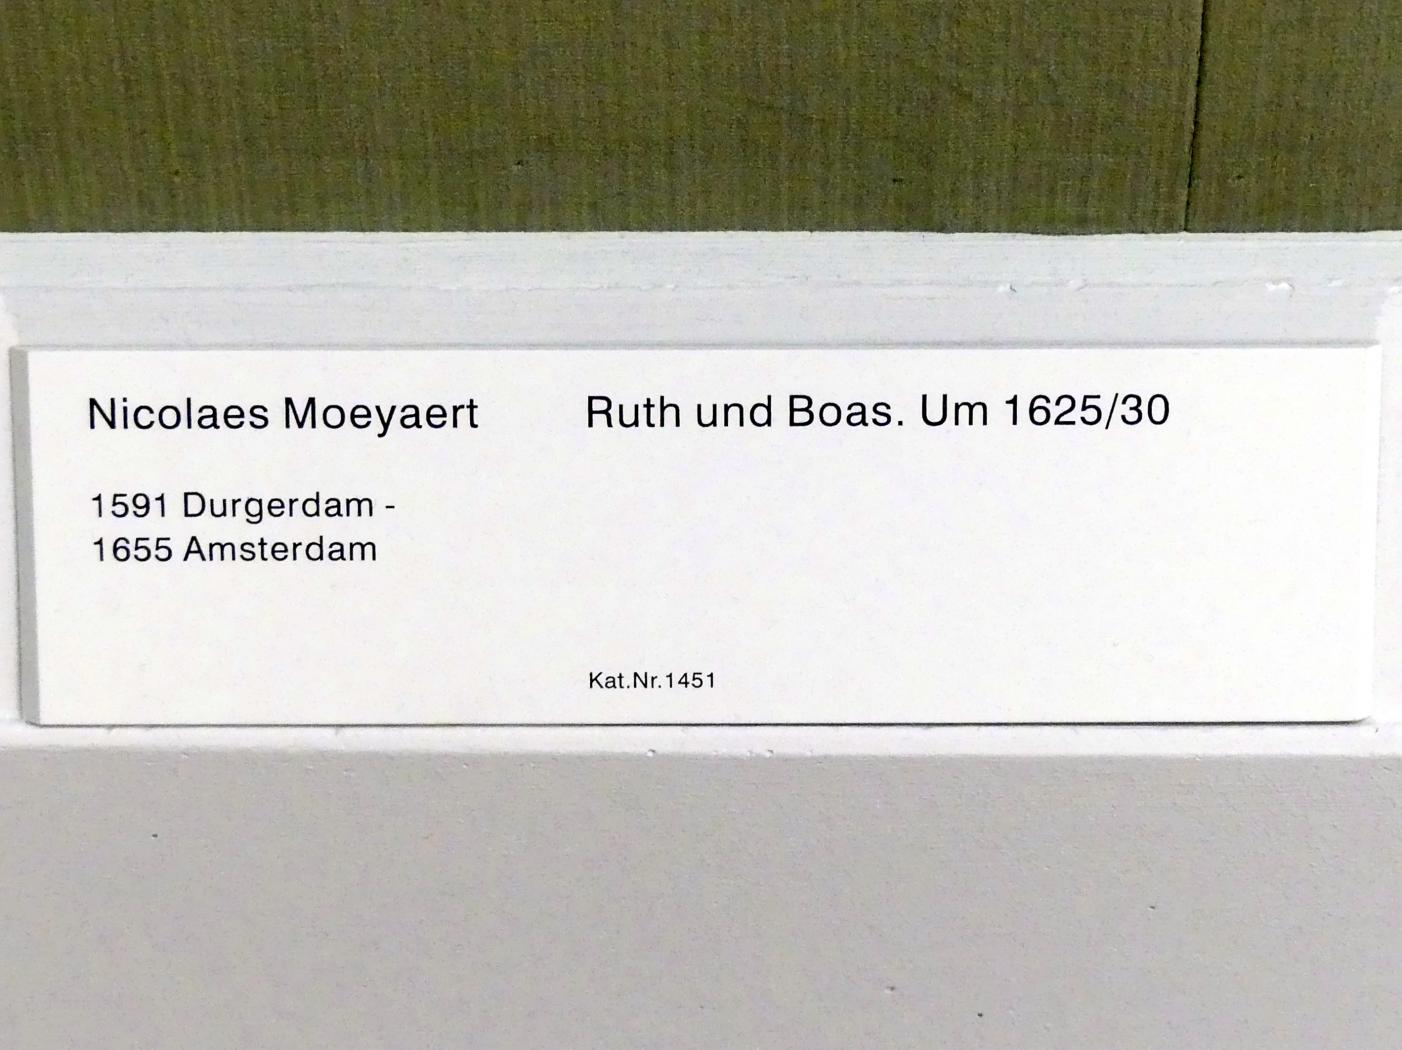 Nicolaes Moeyaert (Claes Corneliszoon Moeyaert): Ruth und Boas, 1625 - 1630